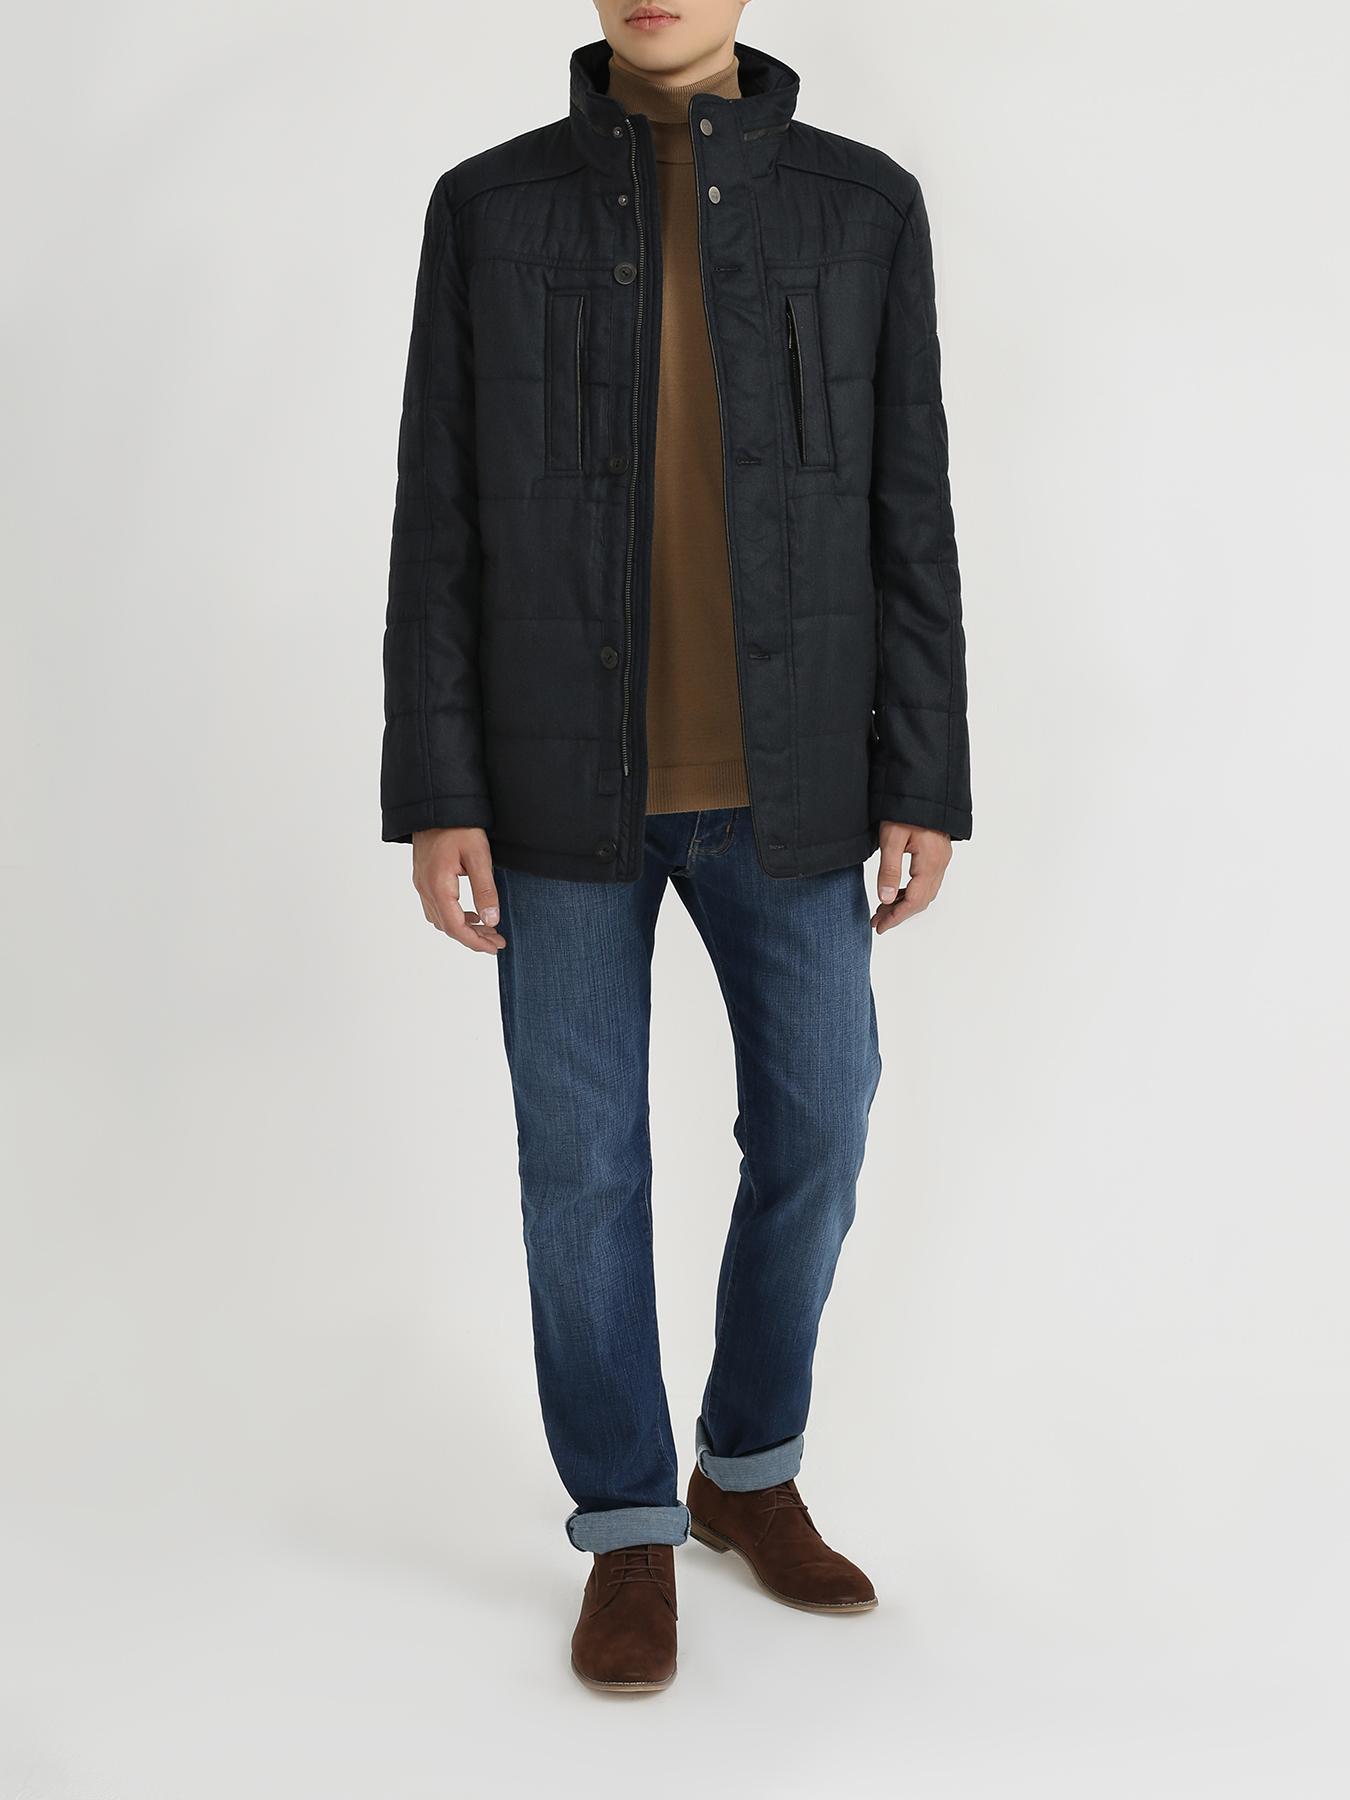 Куртка Ritter Стеганая куртка куртка karl lagerfeld стеганая куртка